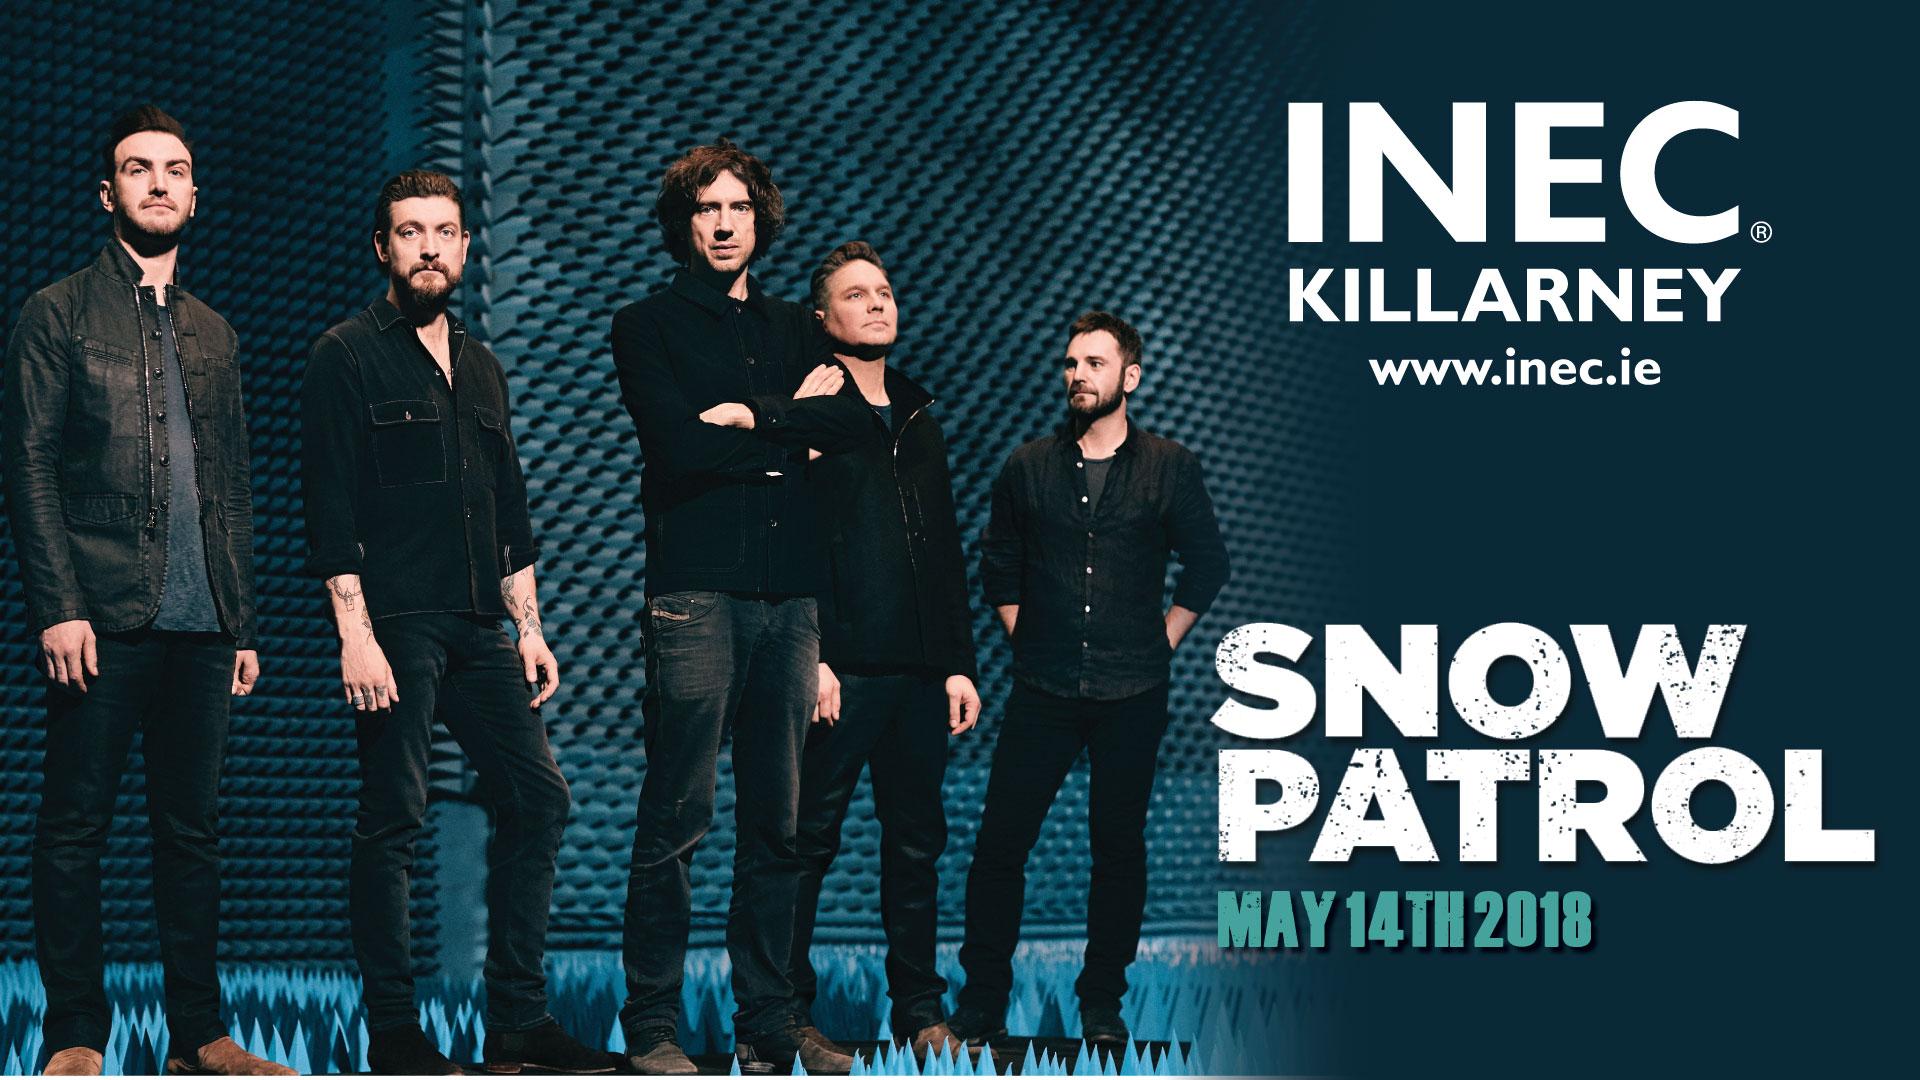 Snow Patrol return to the INEC Killarney on MAy 14th 2018